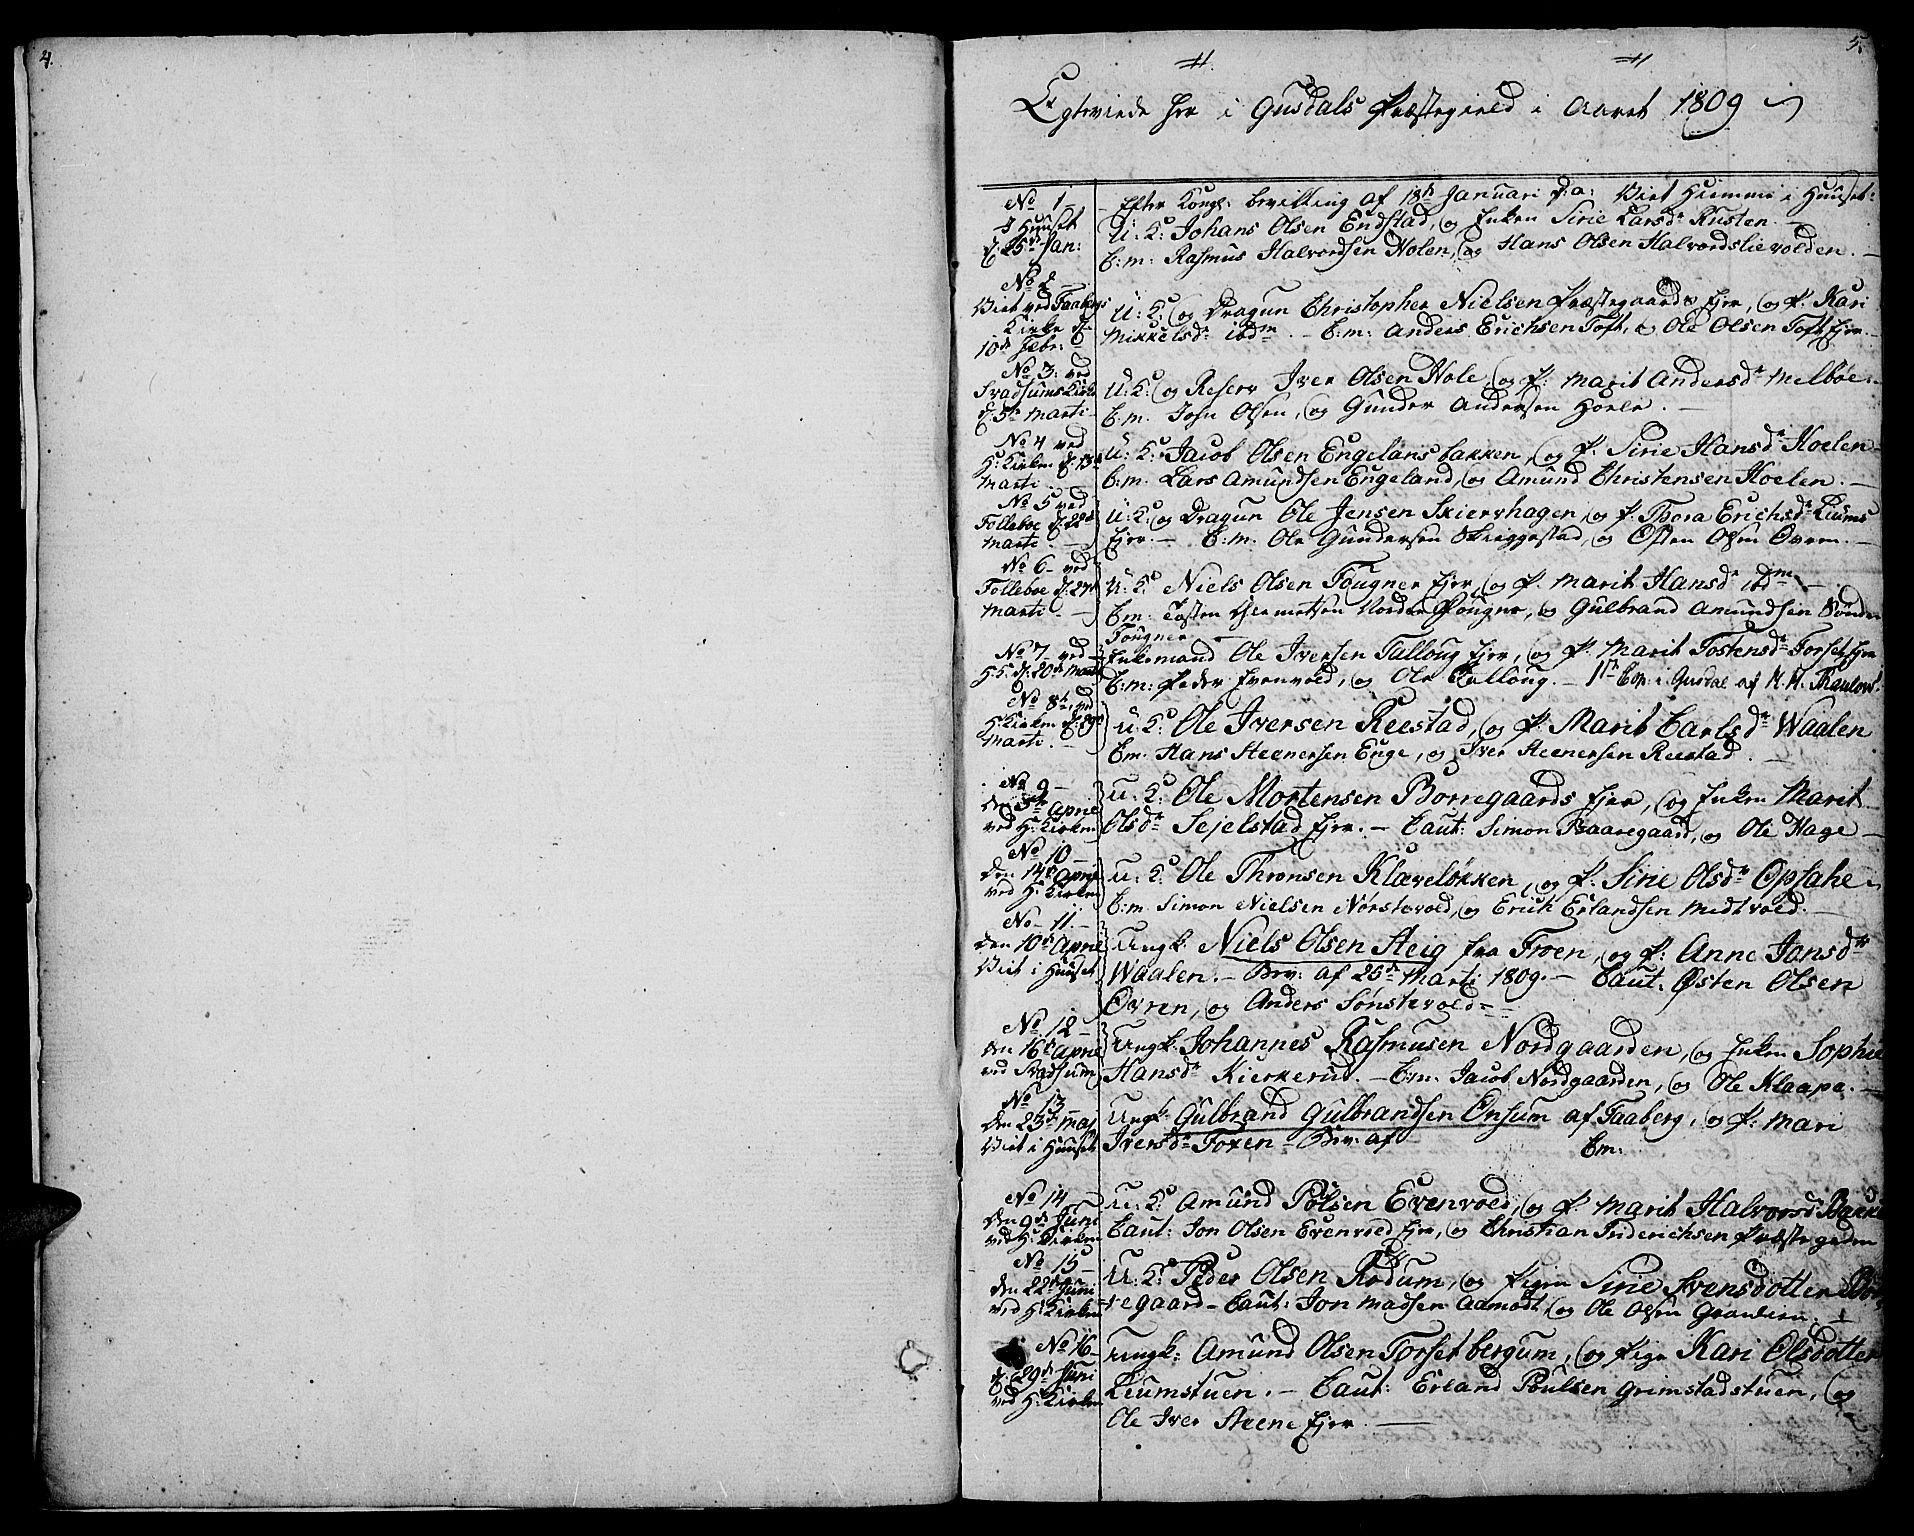 SAH, Gausdal prestekontor, Ministerialbok nr. 4, 1809-1817, s. 4-5